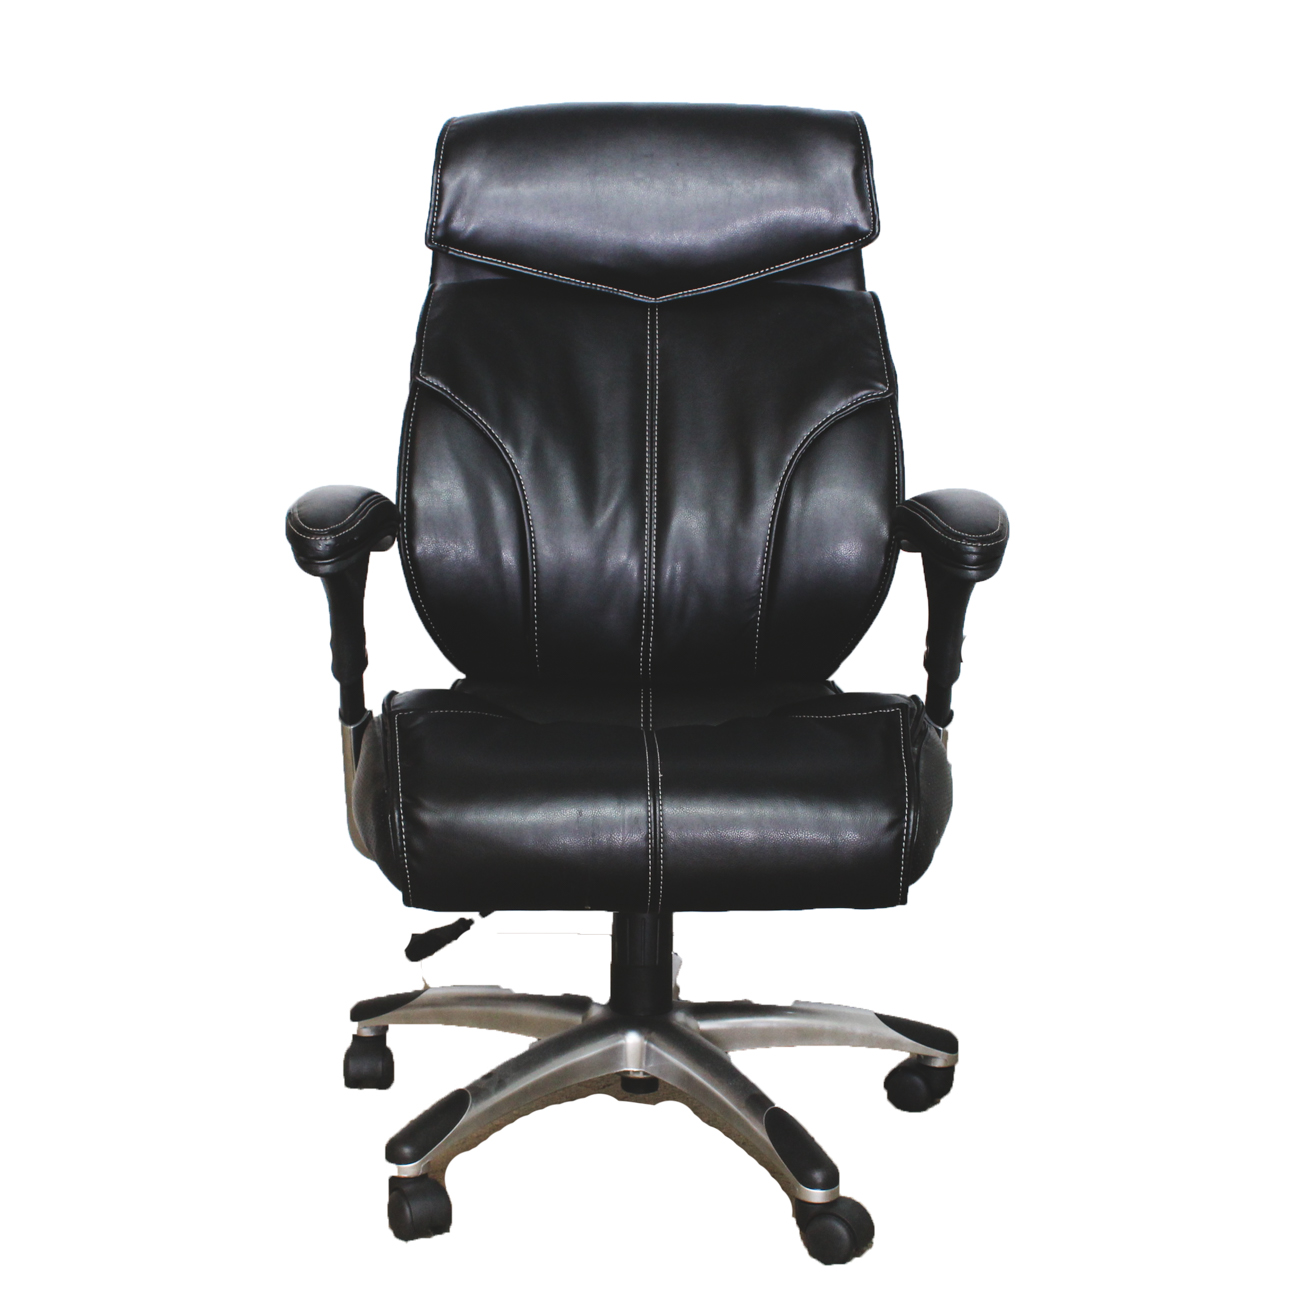 true innovations office chair folding bar stool chairs black leather executive ebth